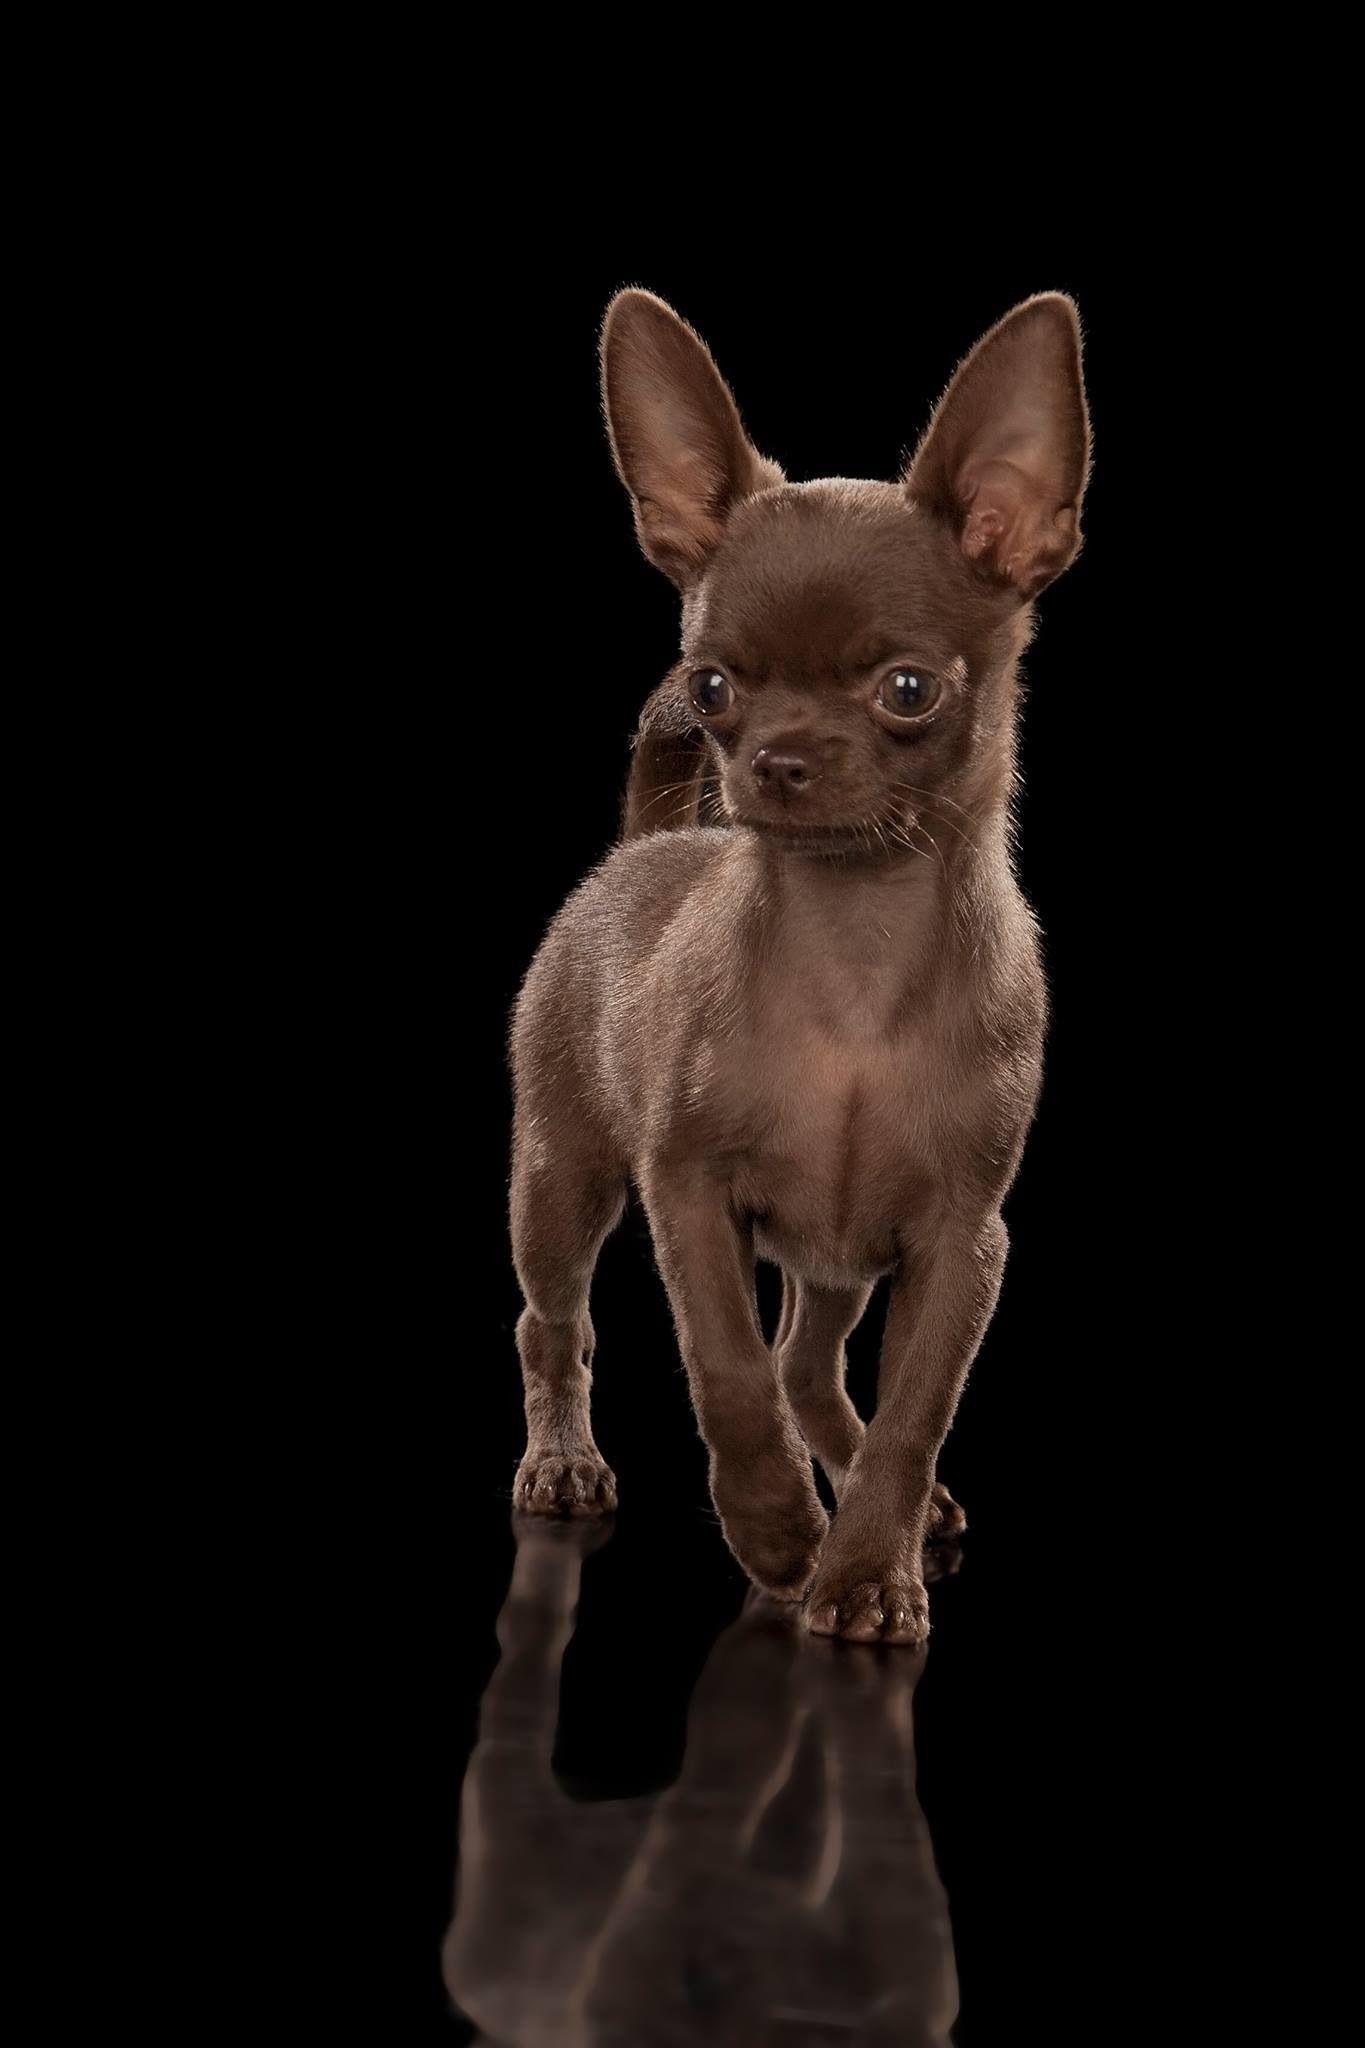 Stunningly Beautiful Chihuahua Www Bluechihuahua Net Chihuahua